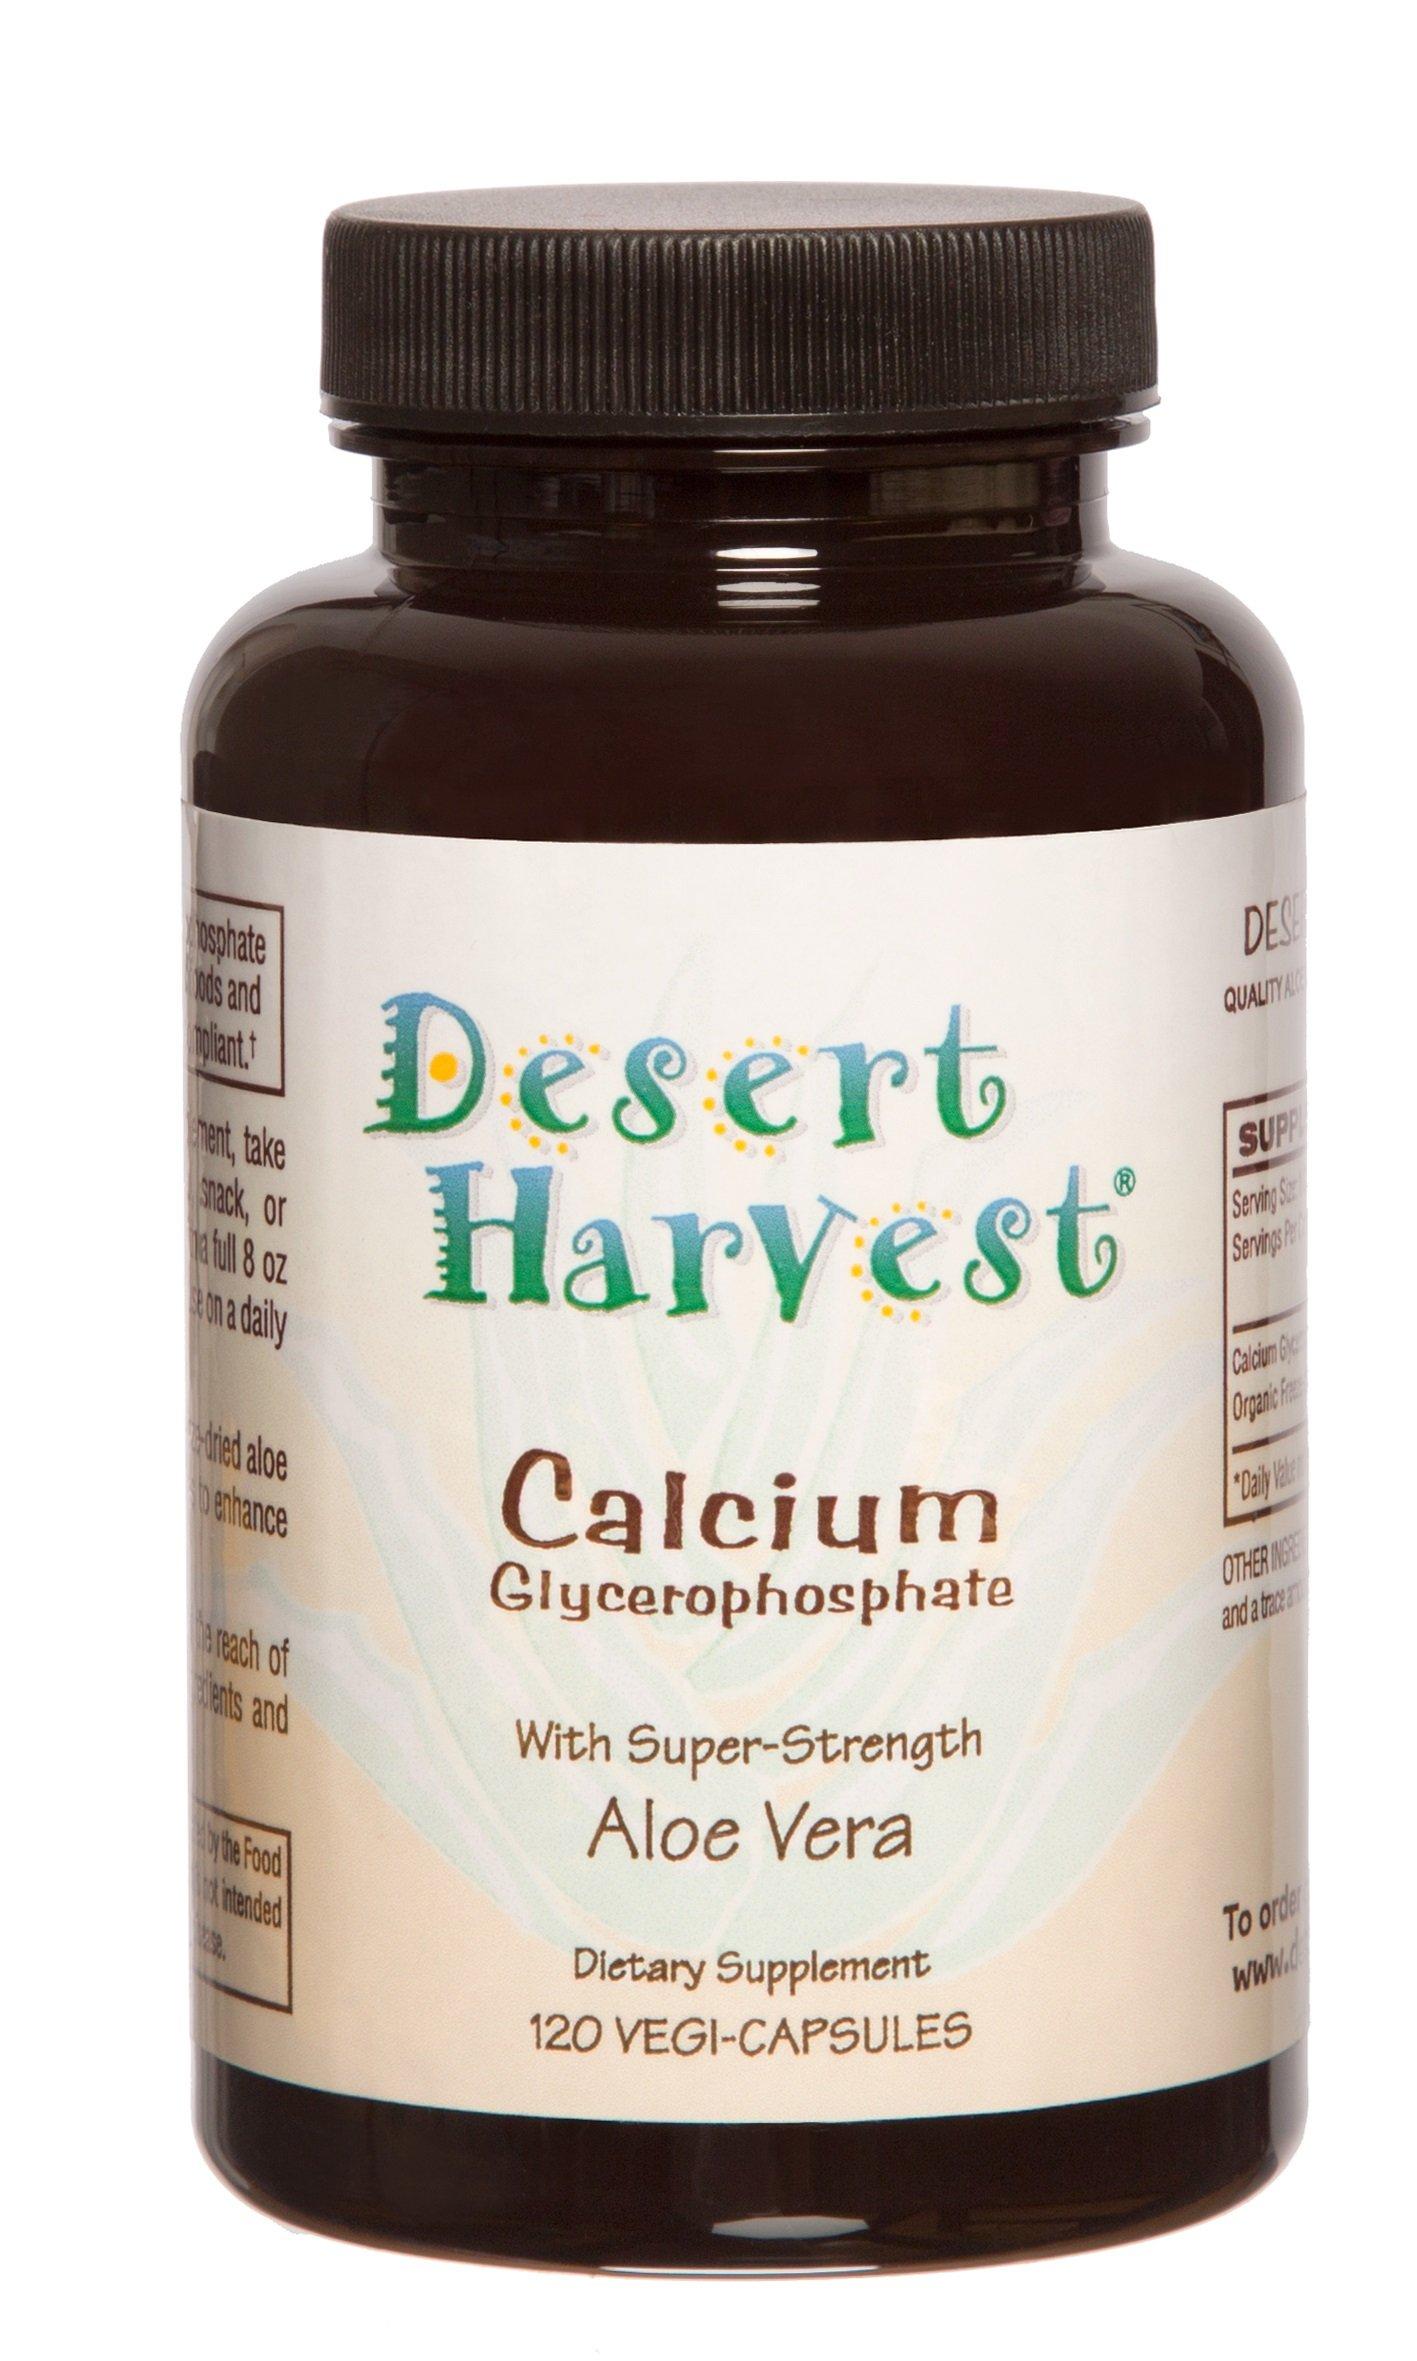 Interstitial Cystitis Starter Kit – Ideal Starter Supplements for IC/BPS. Super-Strength Aloe Vera Capsules + Calcium Glycerophosphate + Quercetin. Bladder Pain Relief, antihistamine, Acid Reducer by Desert Harvest (Image #2)